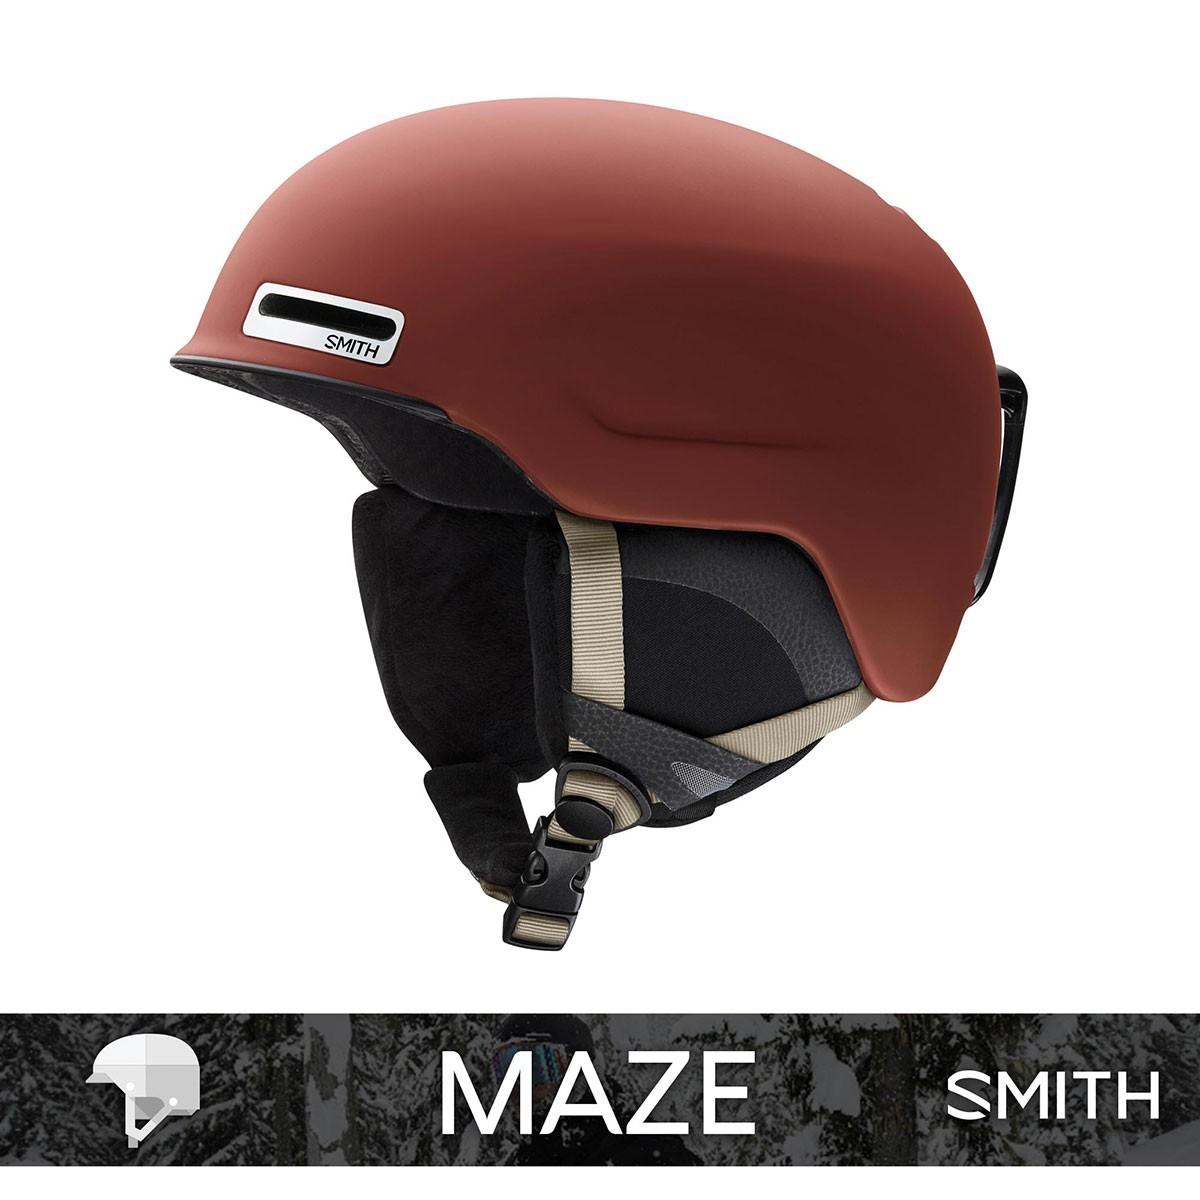 SMITH MAZE matte Adobe - Изображение - AQUAMATRIX